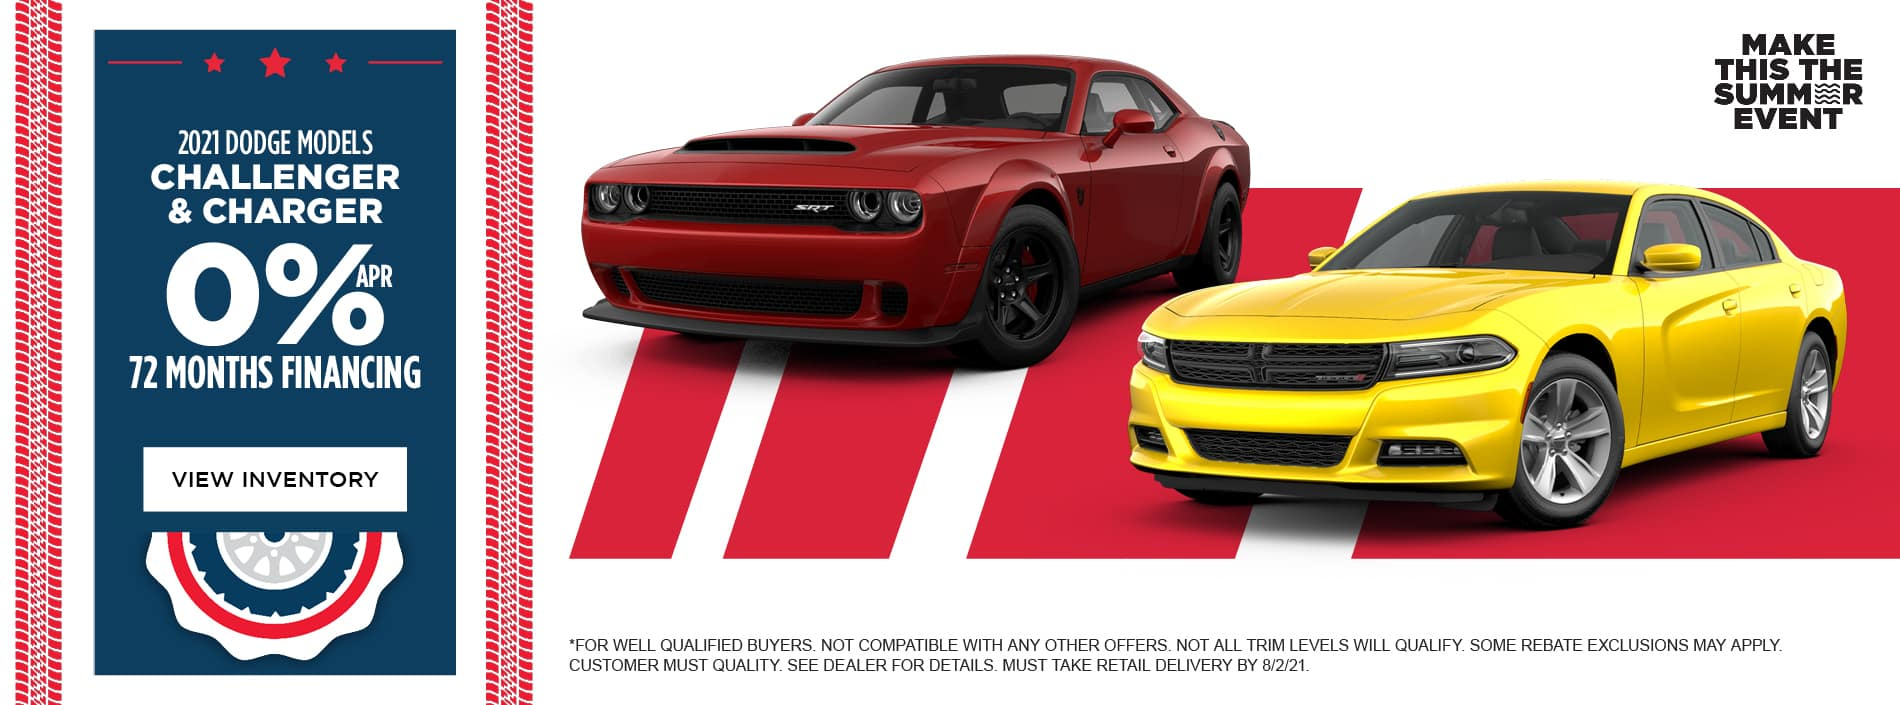 0% APR for 72 months 2021 Dodge Challenger 2021 Dodge Charger